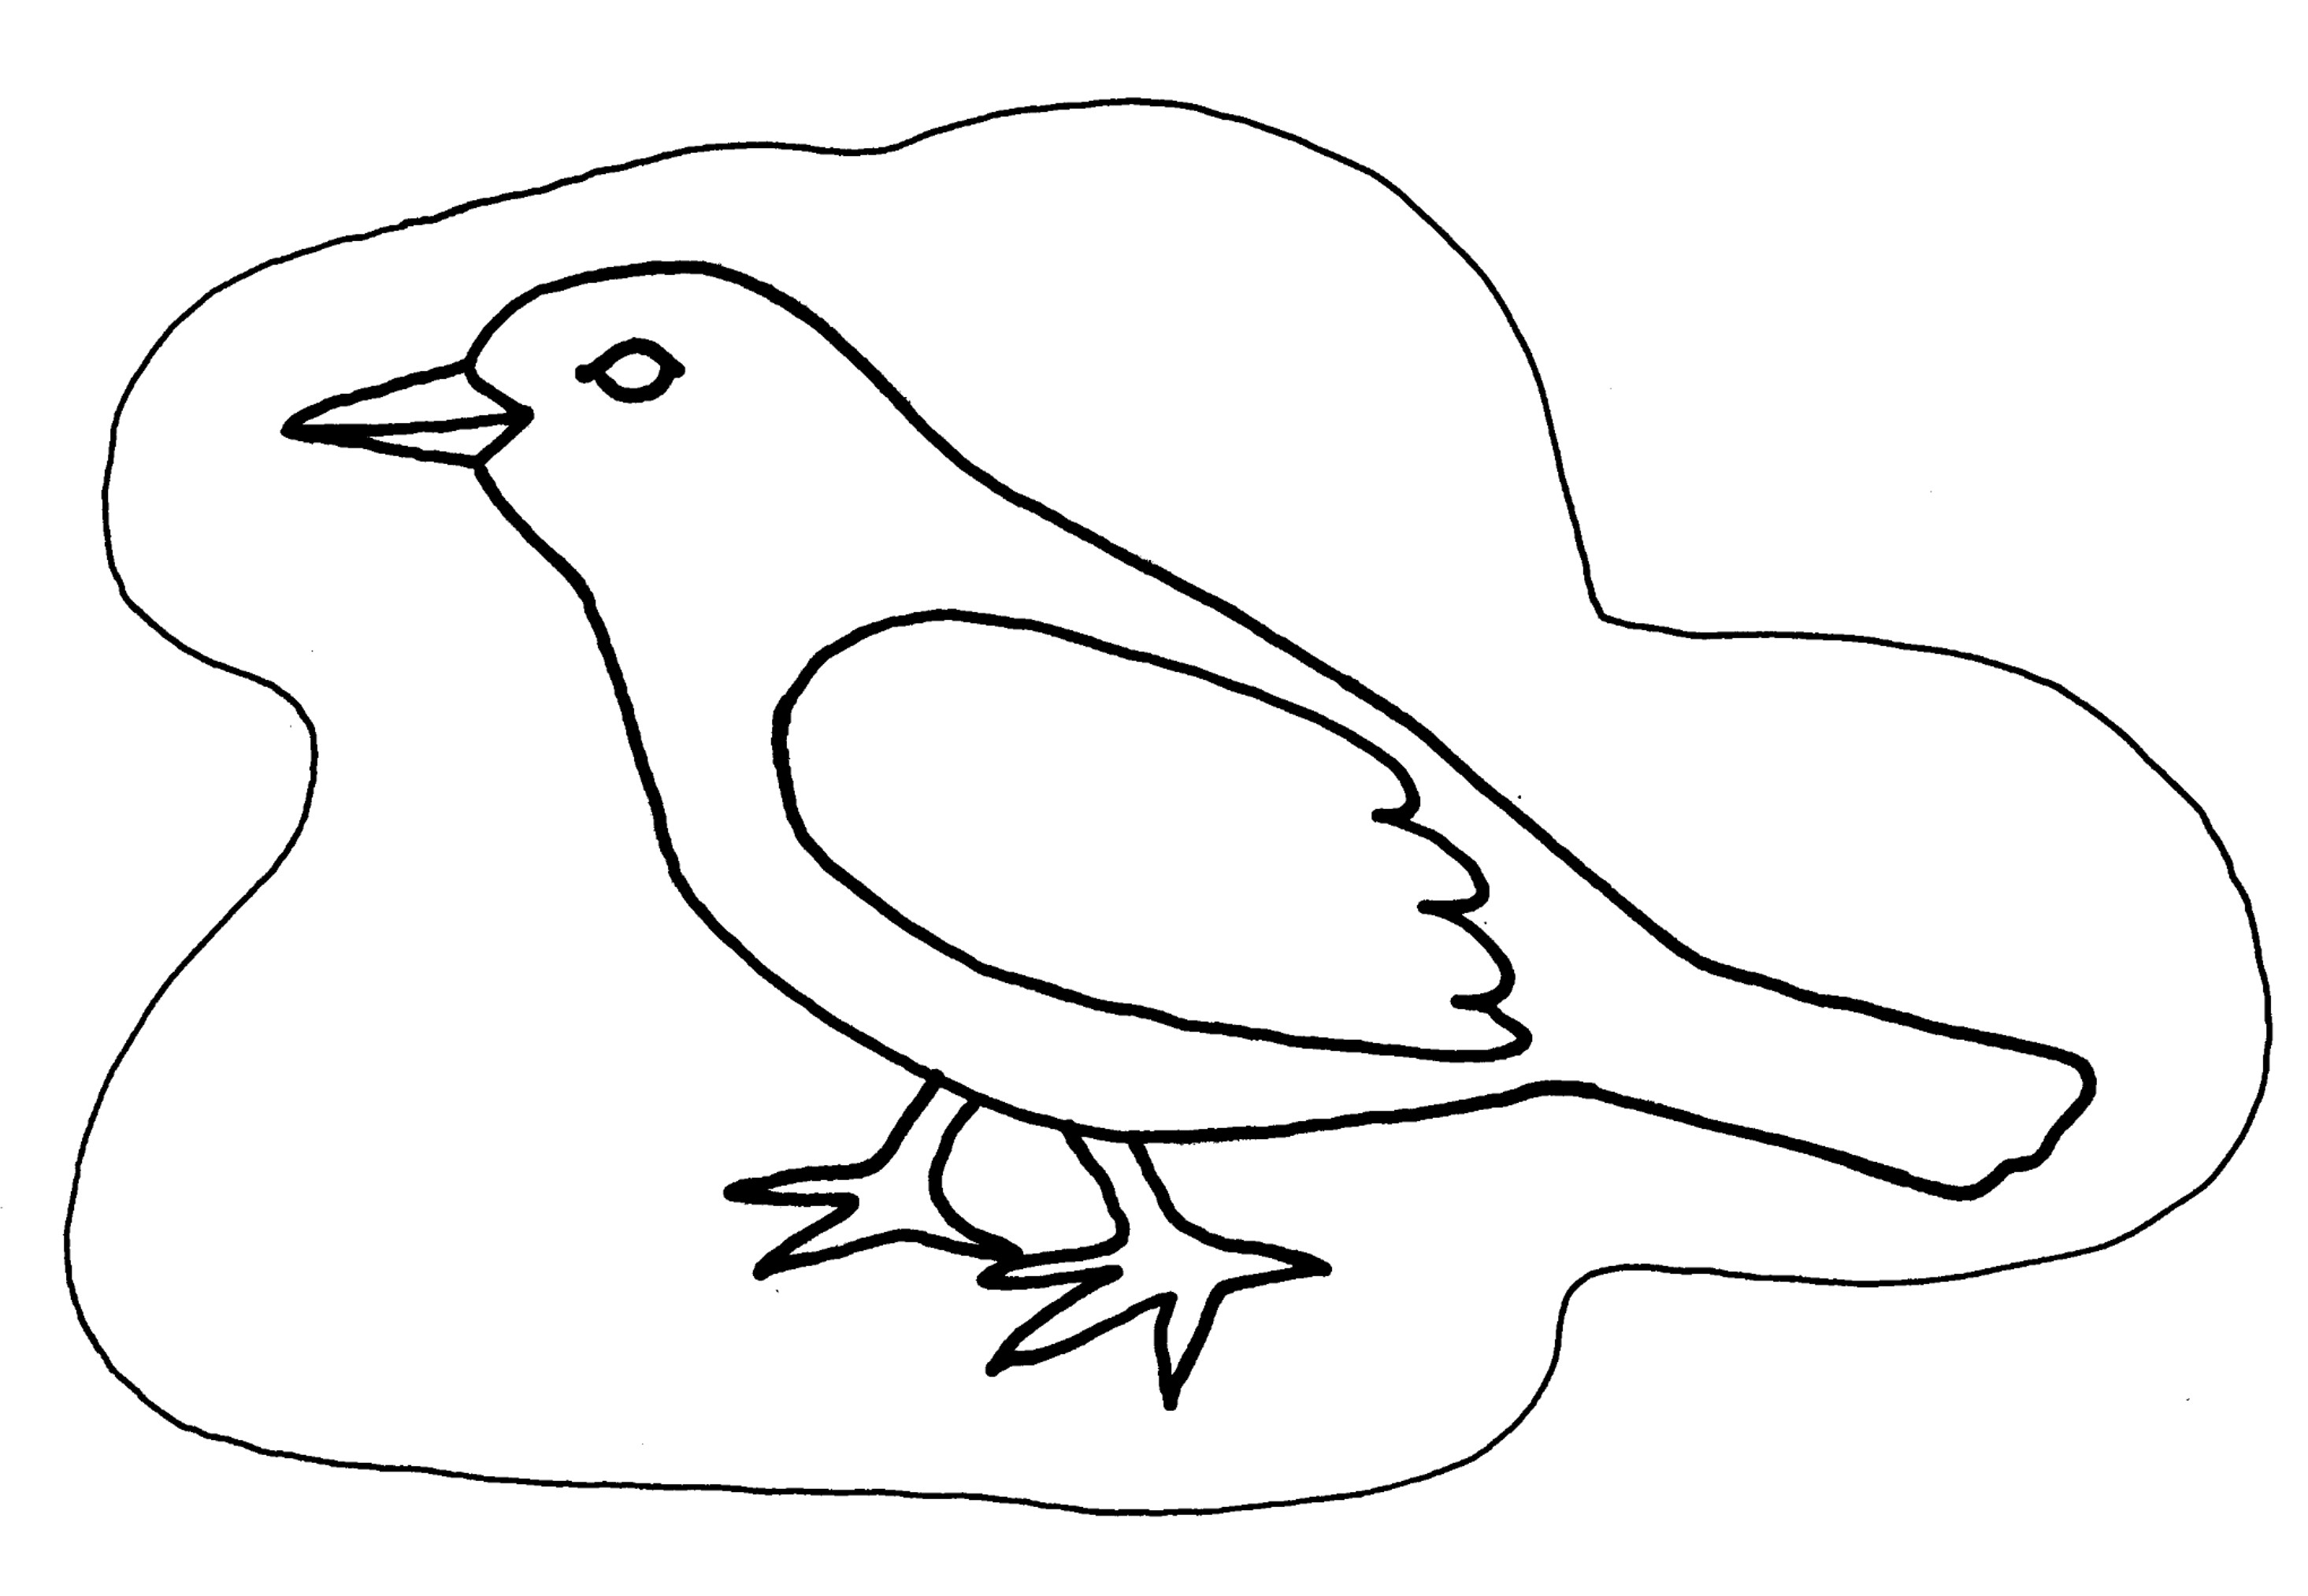 dessin de corbeau  dessin de corbe...